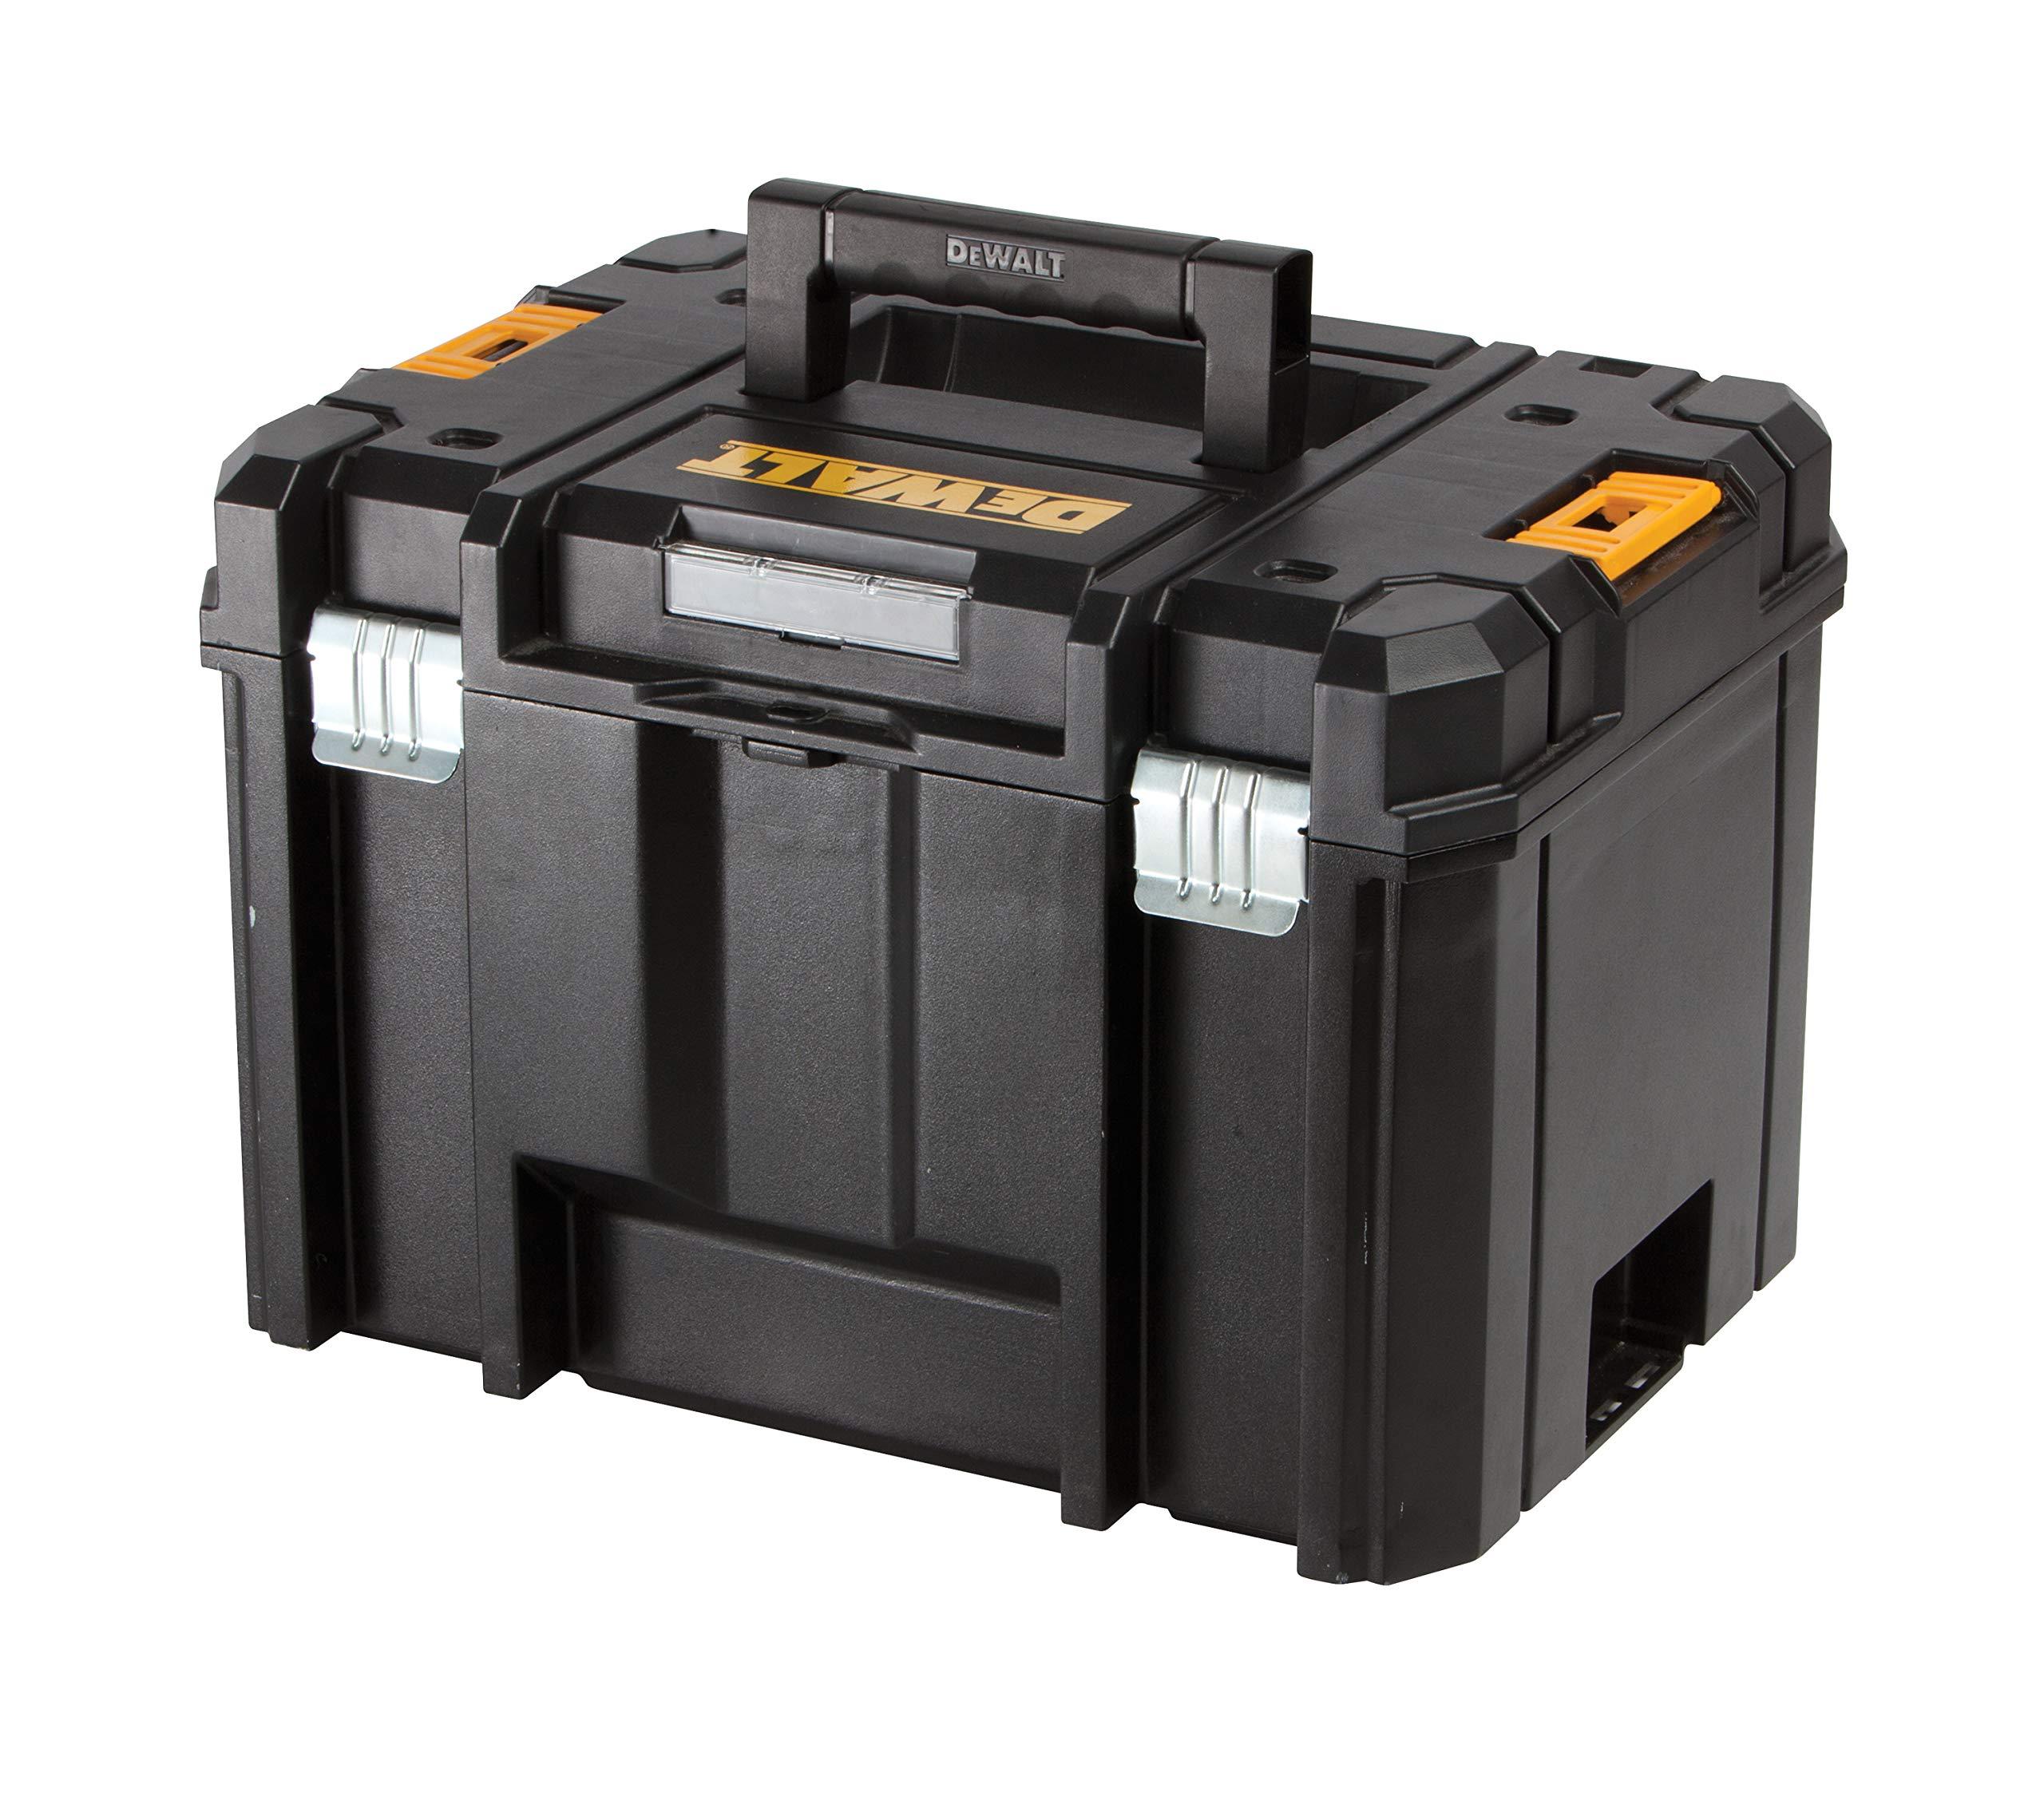 DeWALT TSTAK VI DWST -71195 – Boîte à outils profonde TSTAK VI